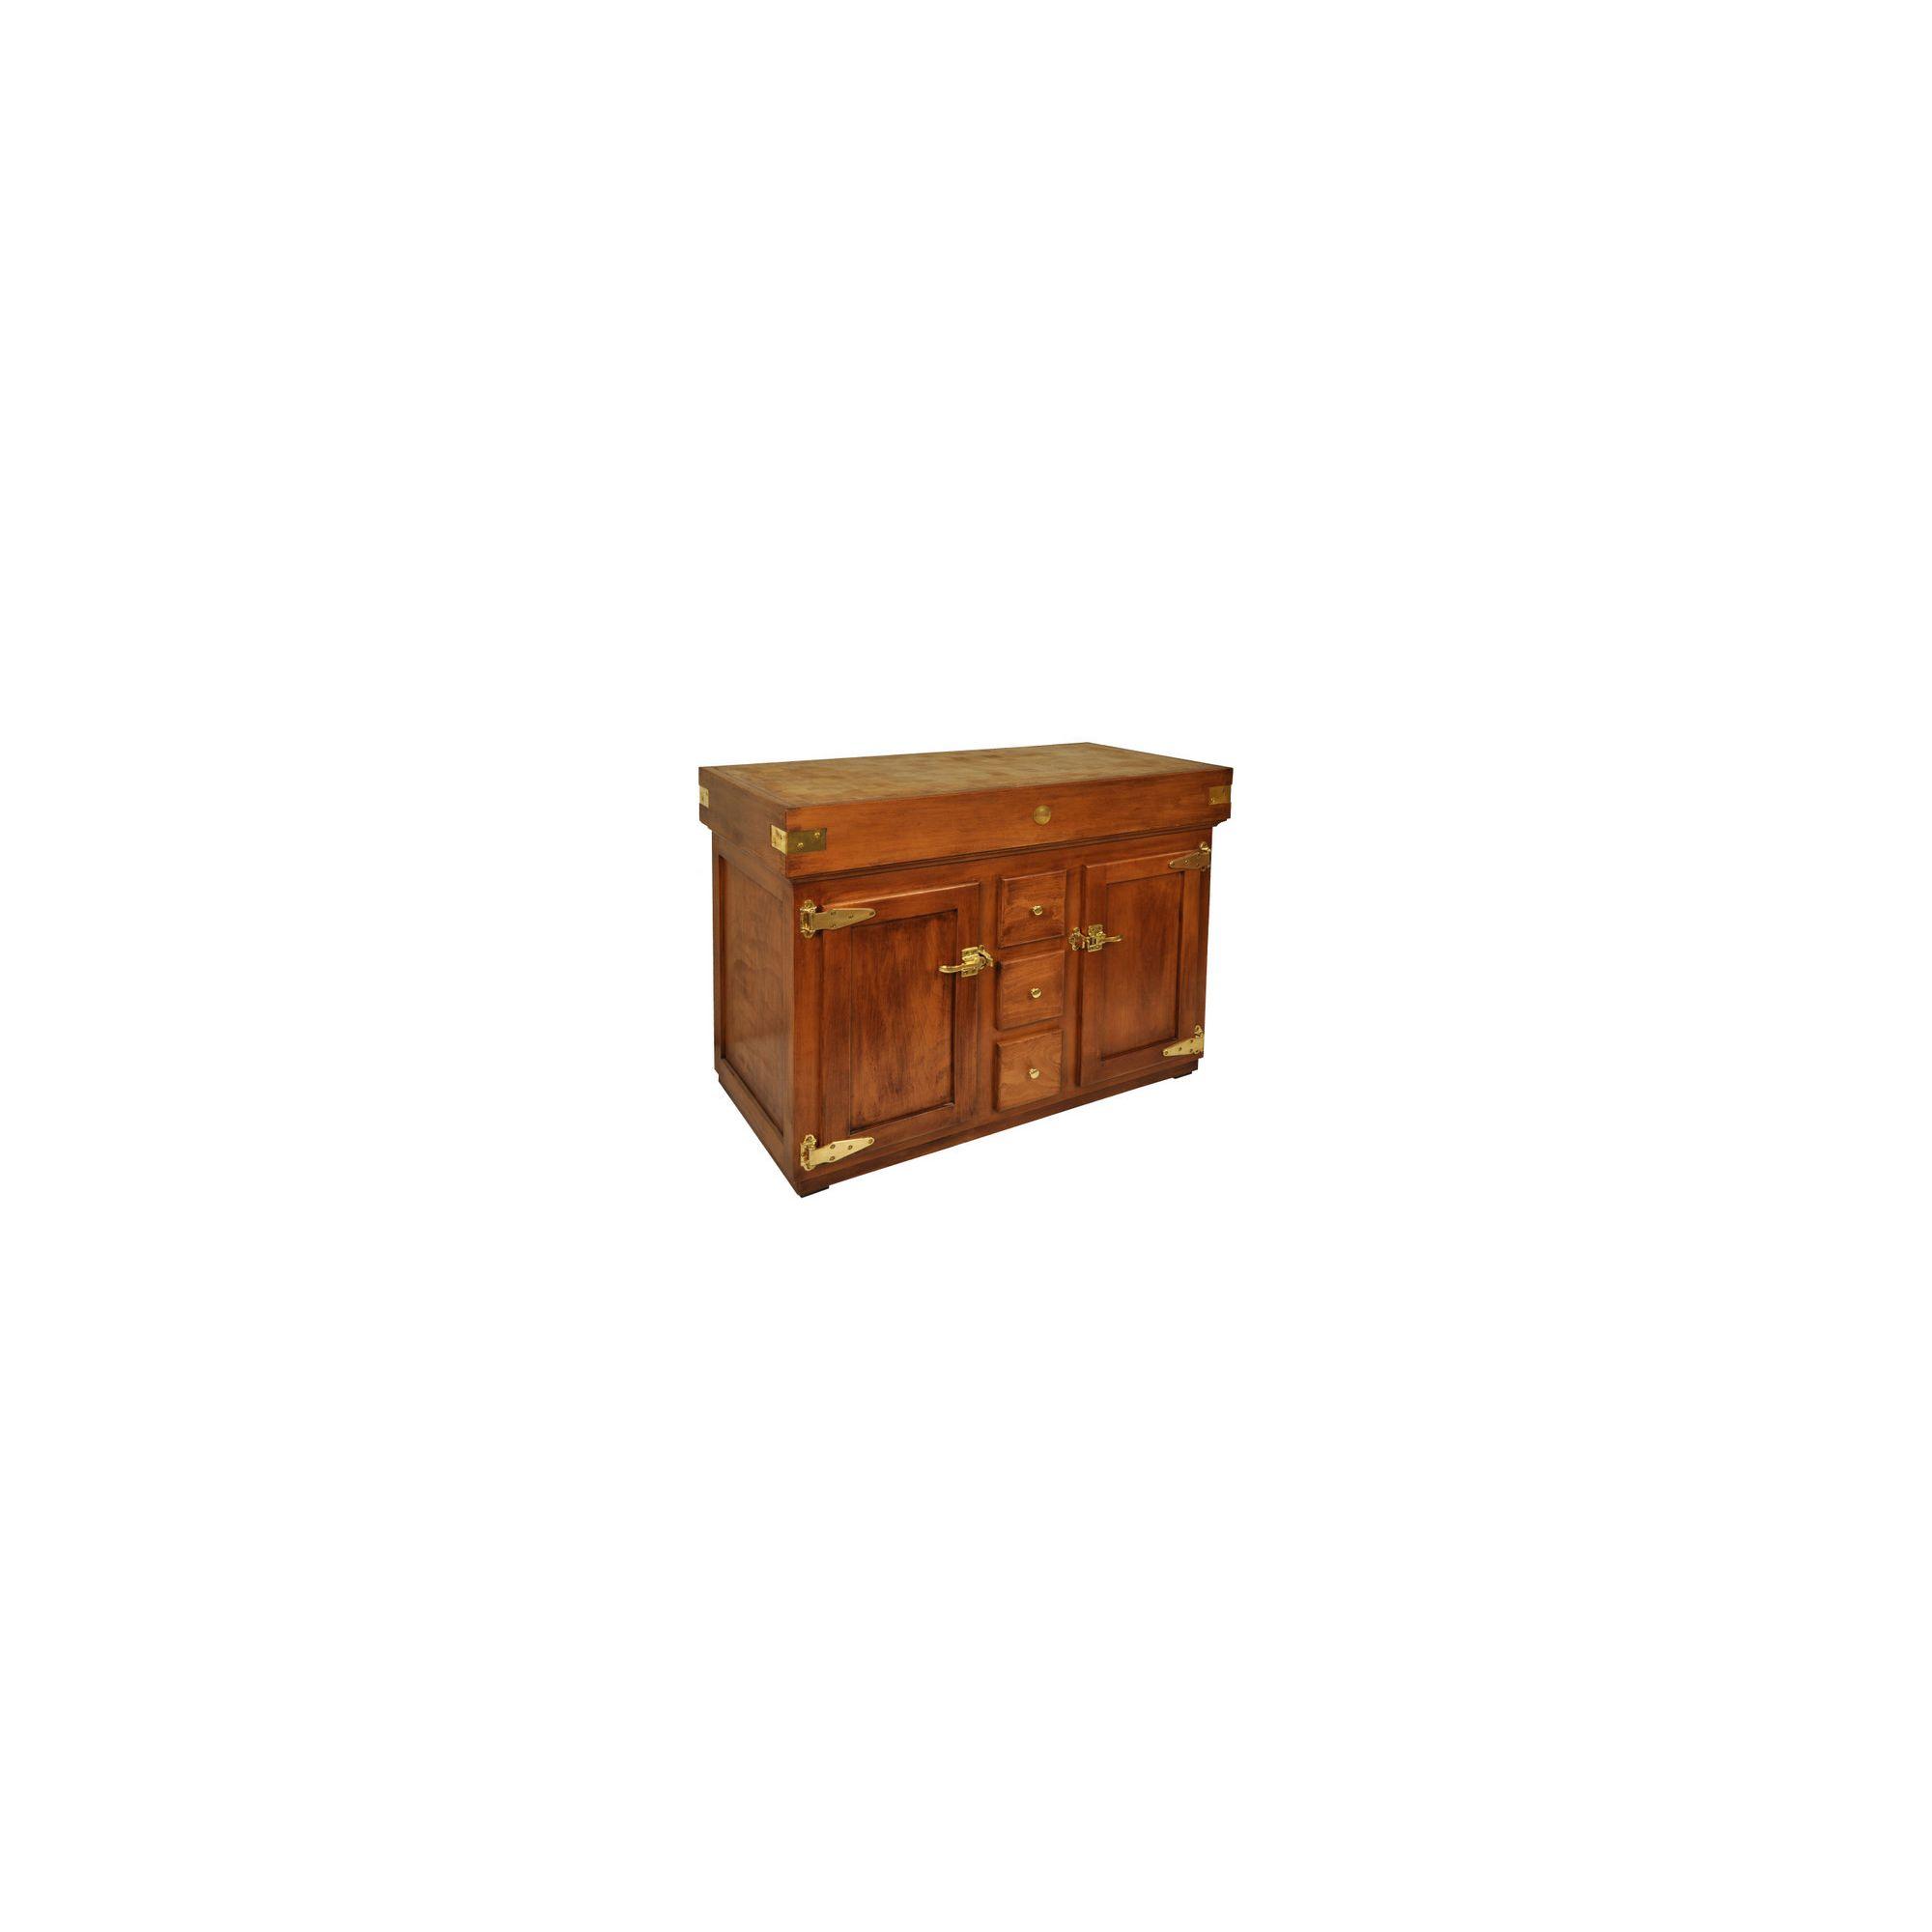 Chabret Antique ''Icebox'' Wooden Block - 90cm X 120cm x 60cm at Tesco Direct